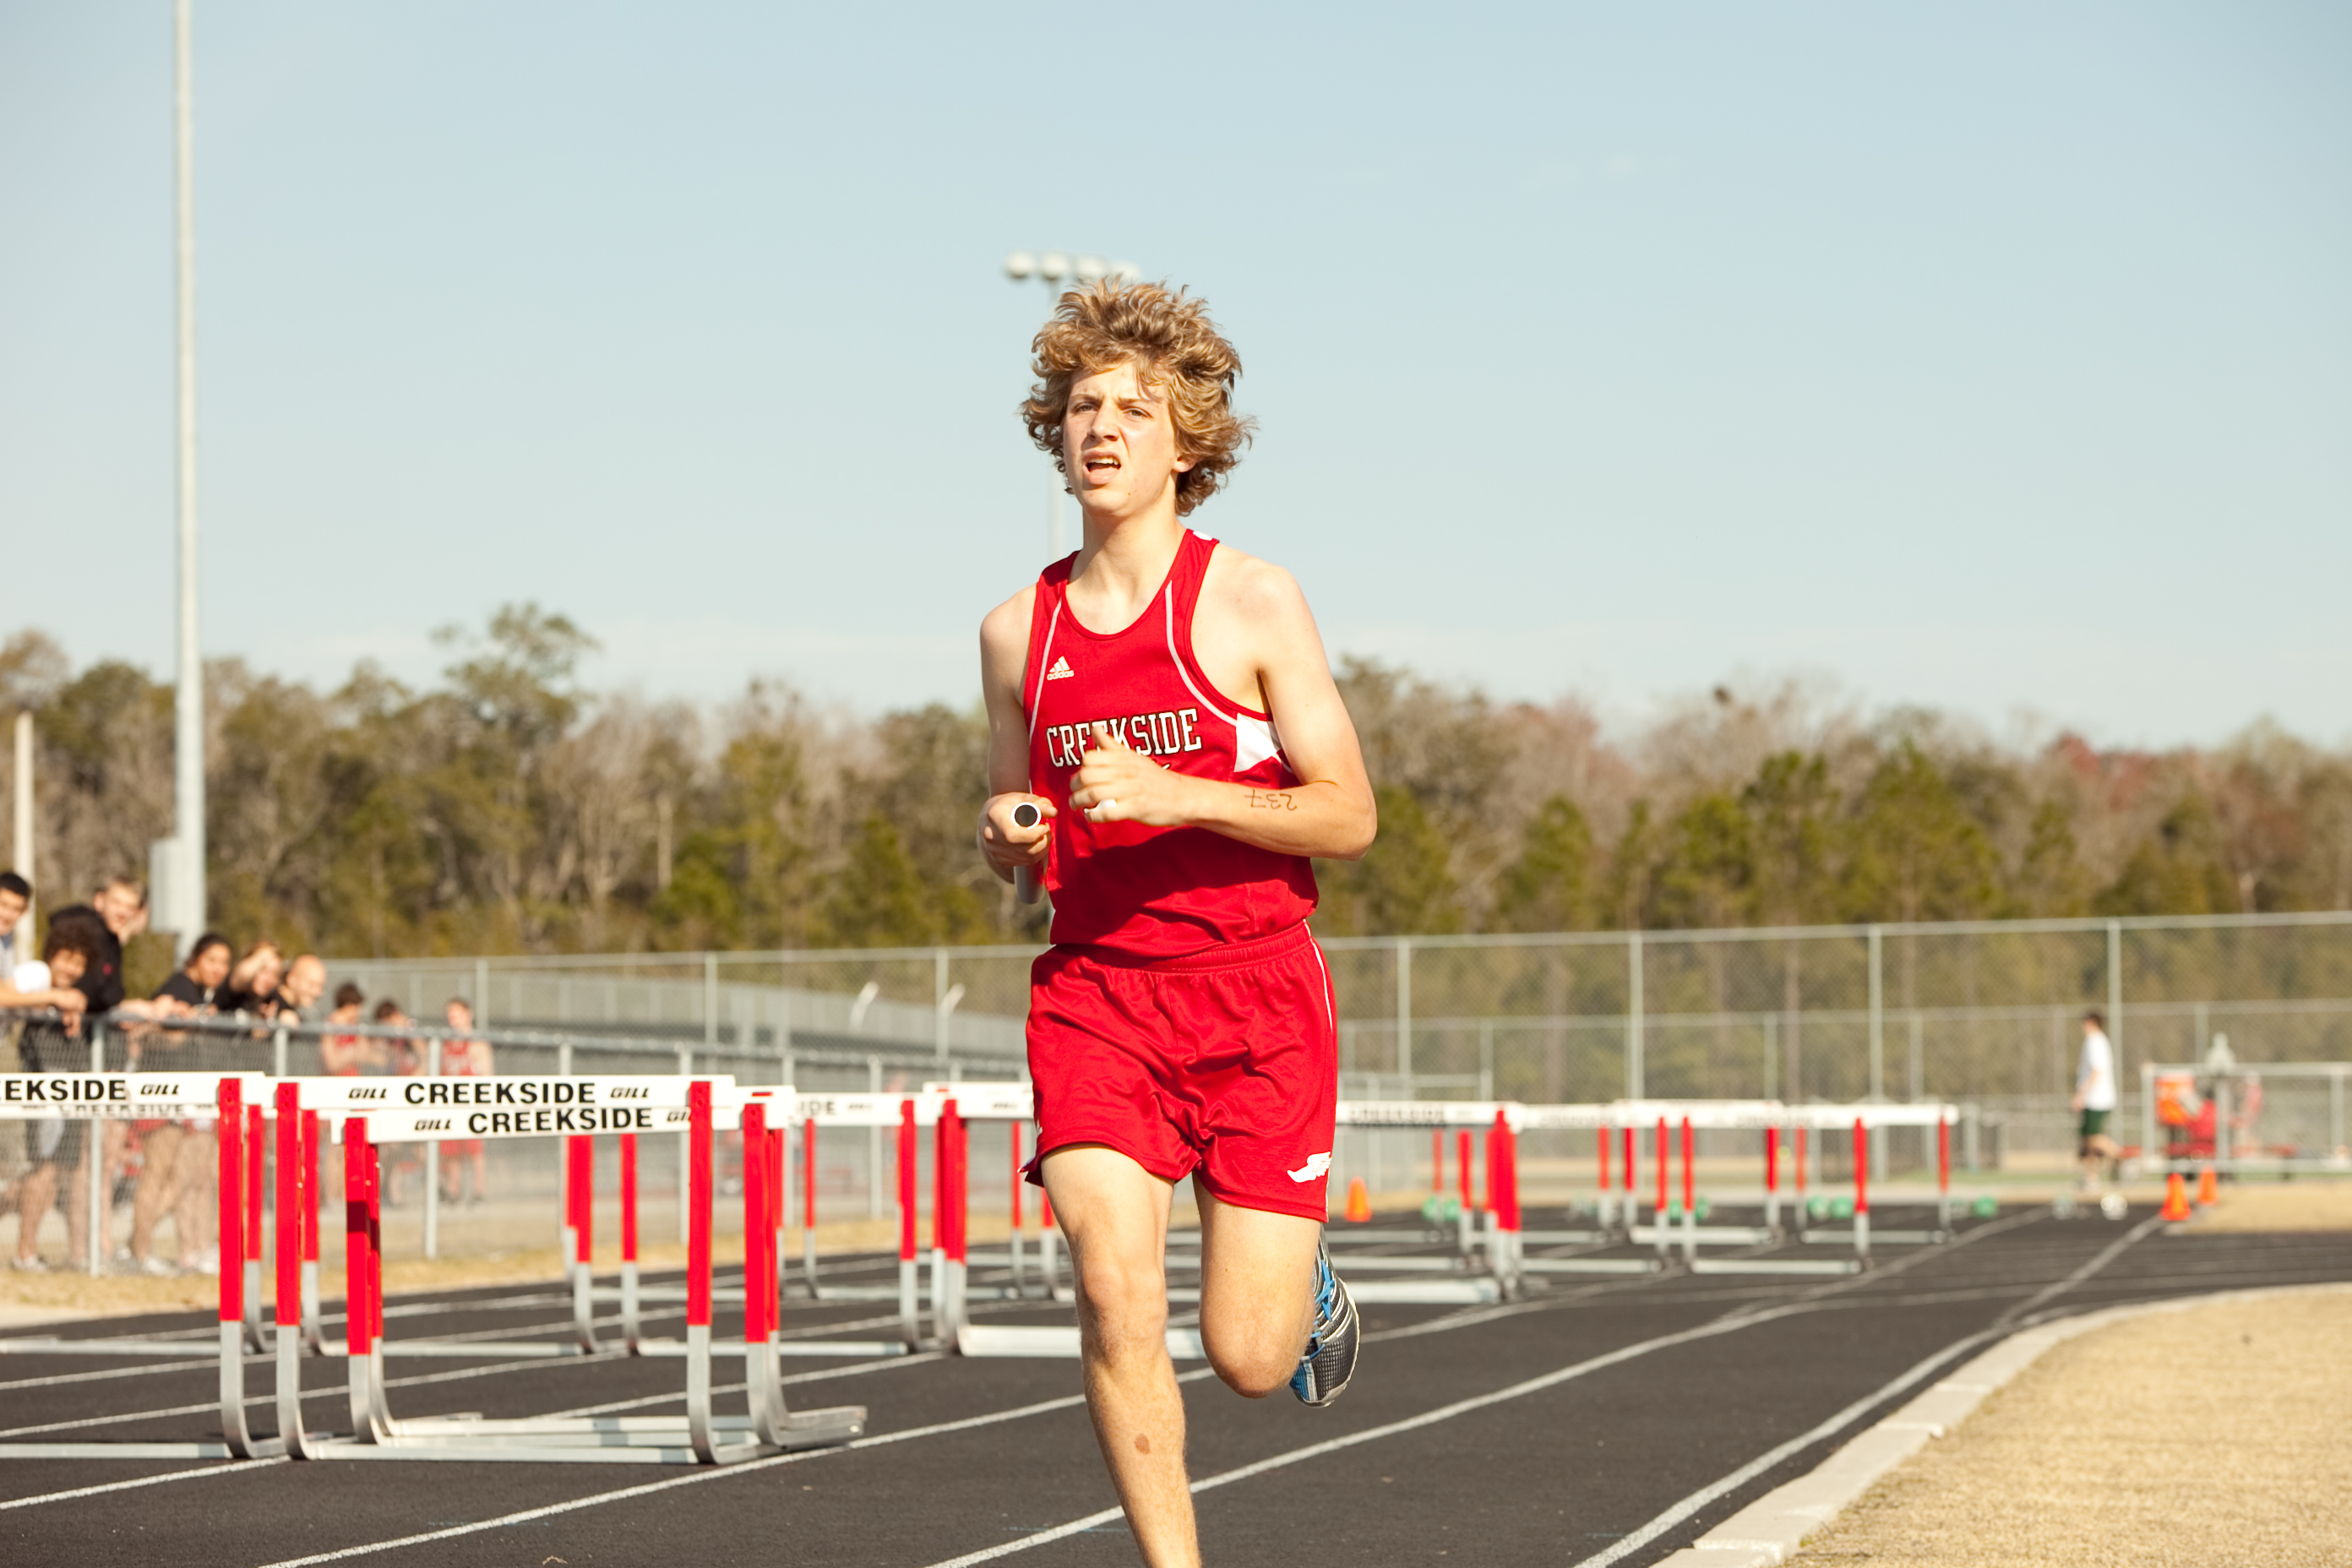 Ben Thiemann running track and field.